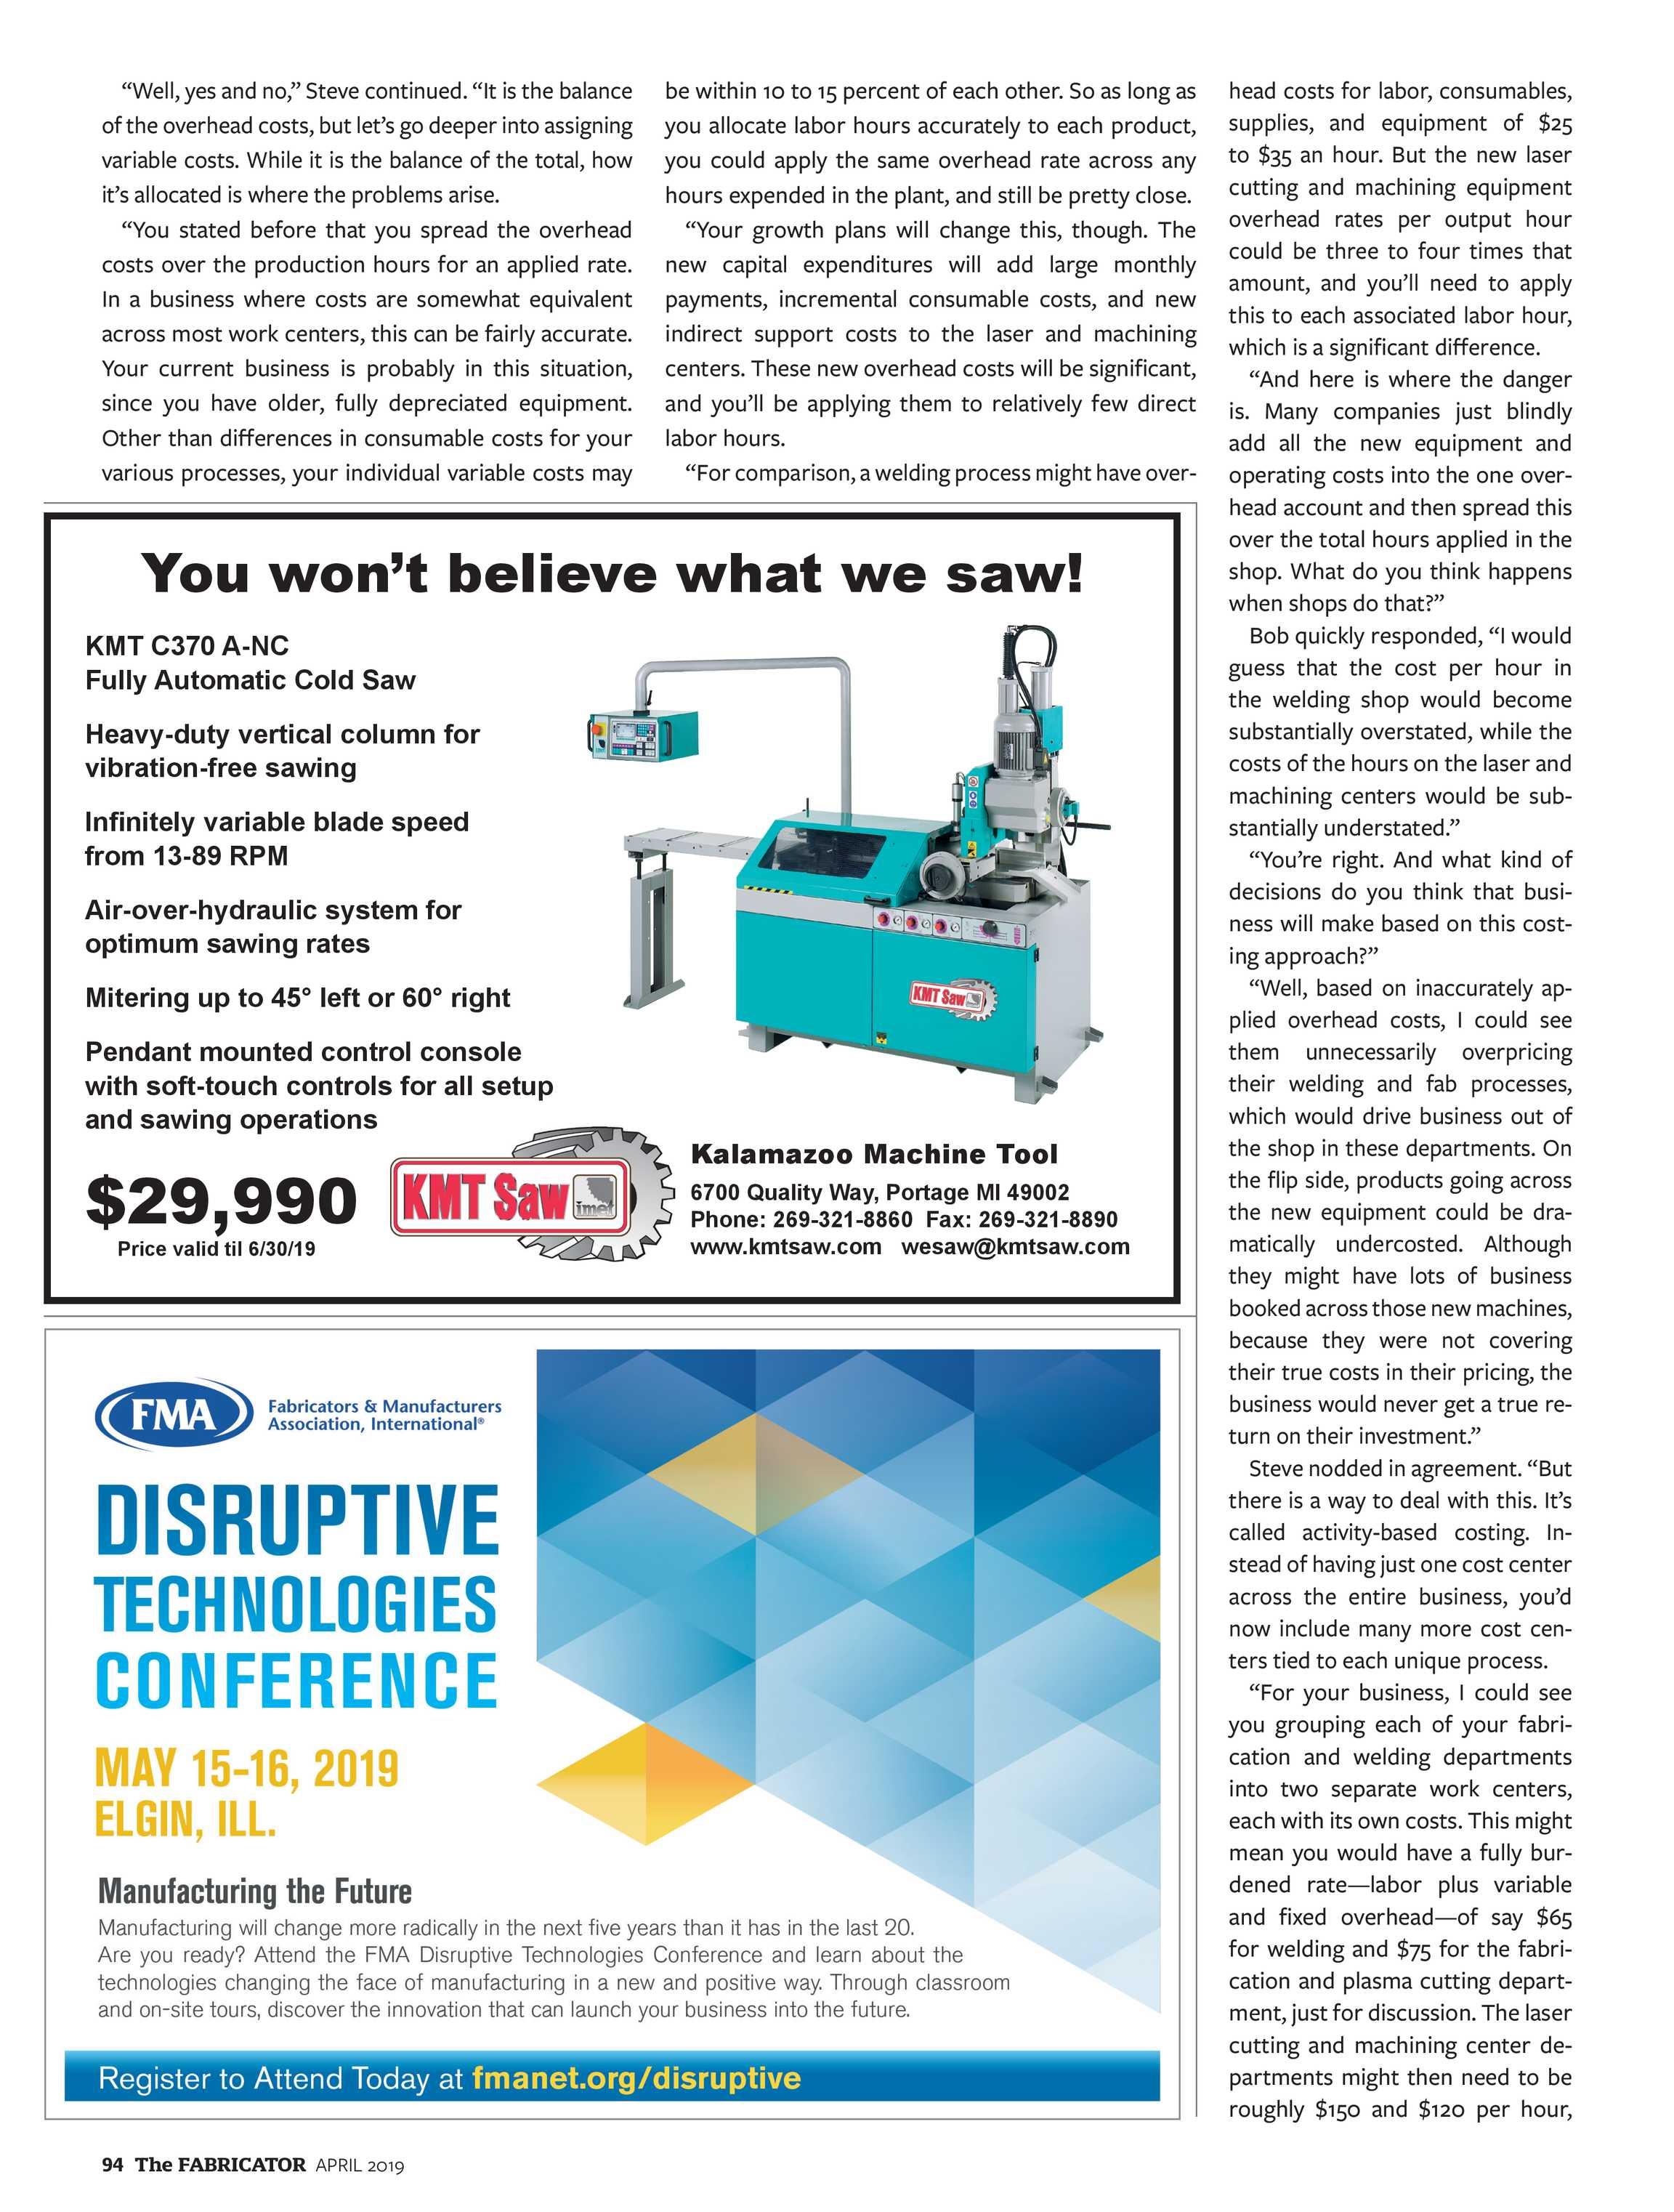 The Fabricator - April 2019 - page 94